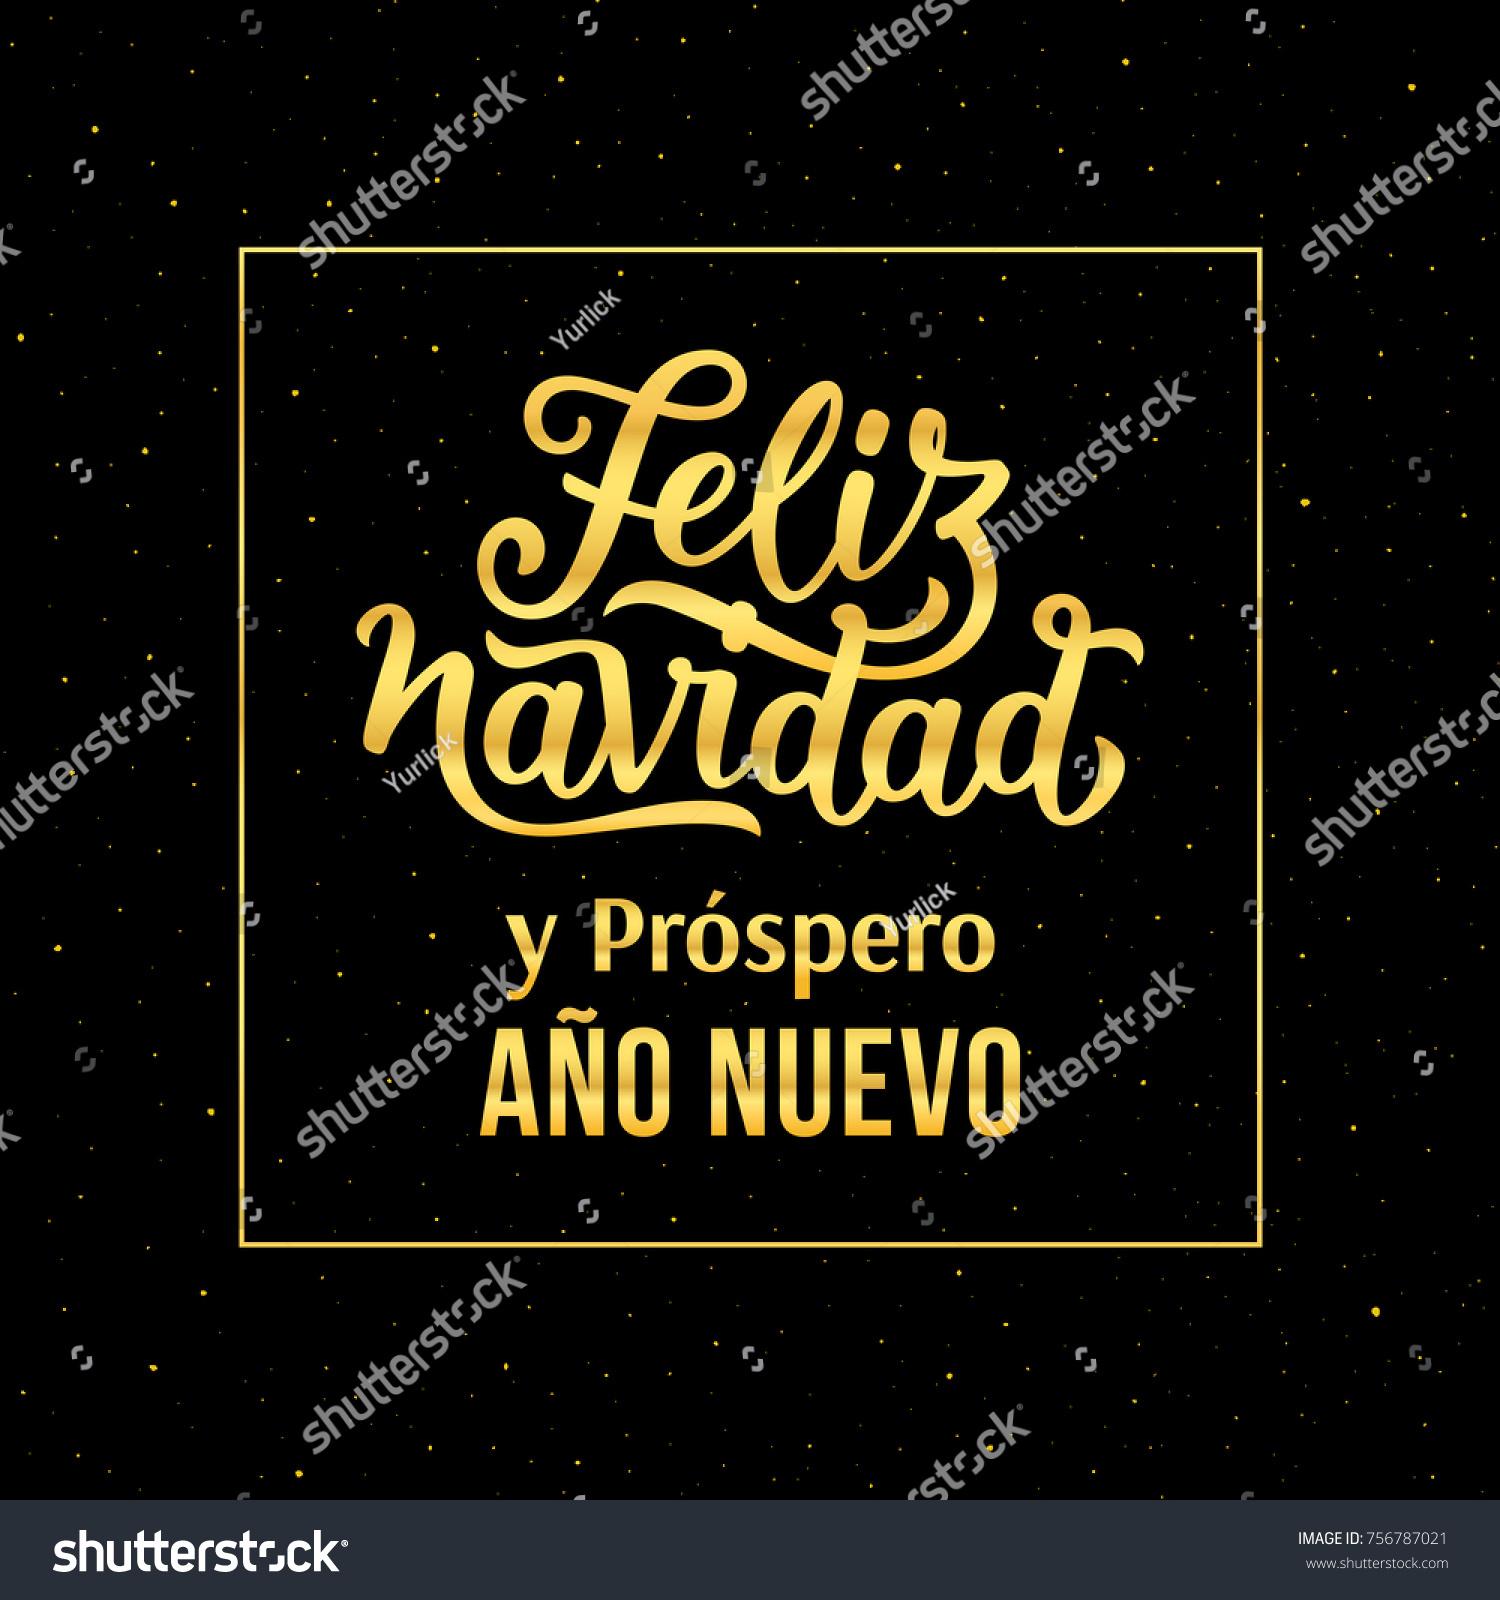 feliz navidad e prospero ano nuevo stock vector royalty free 756787021 https www shutterstock com image vector feliz navidad e prospero ano nuevo 756787021